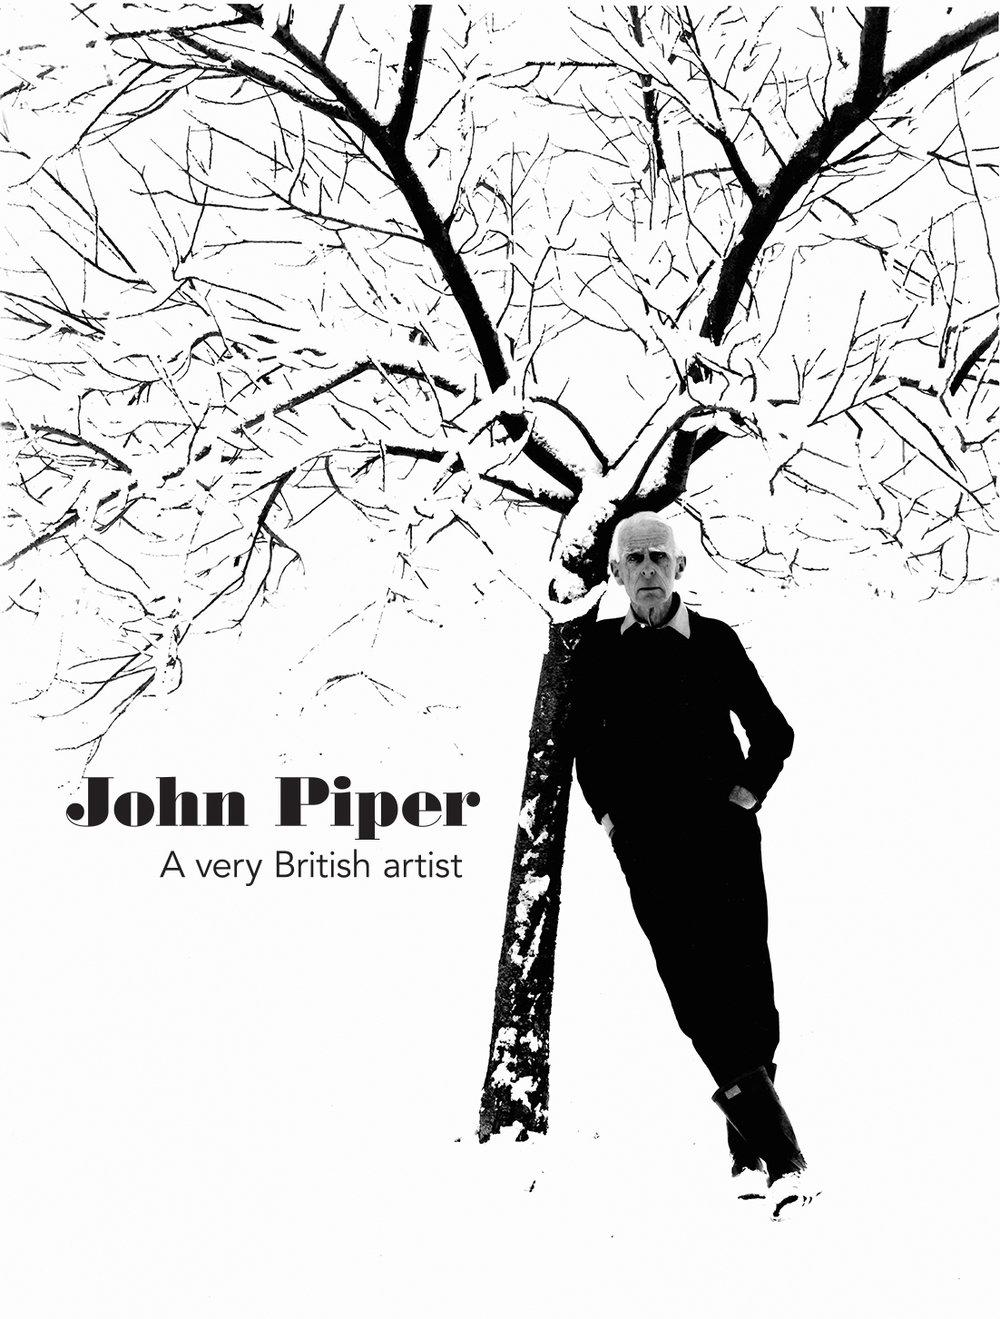 John Piper Gallery